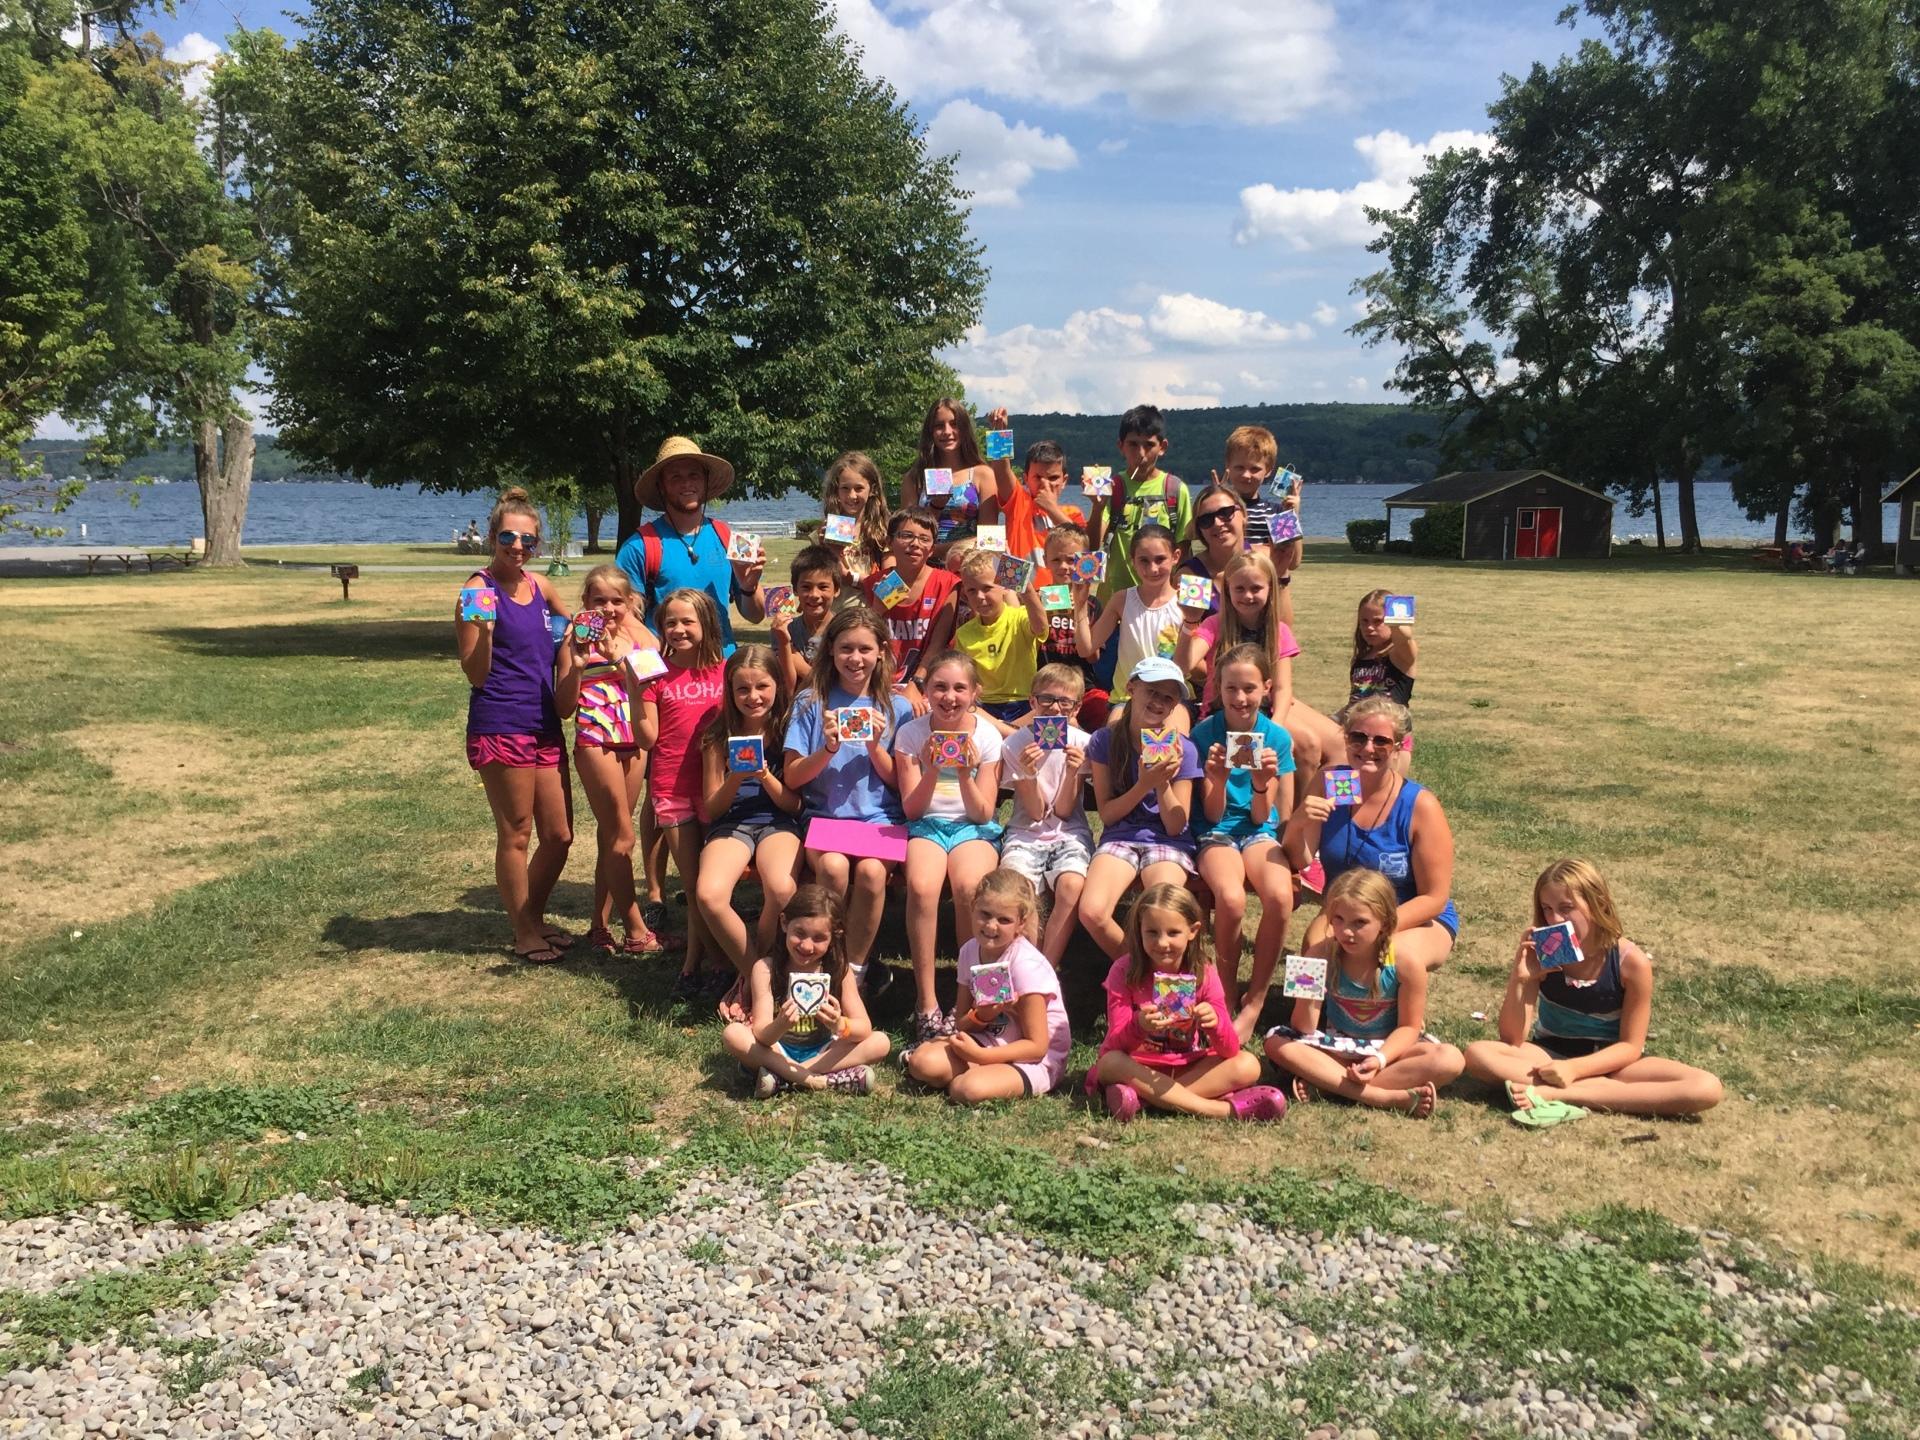 Canandaigua Park & Rec. Kids Summer Camp 2016